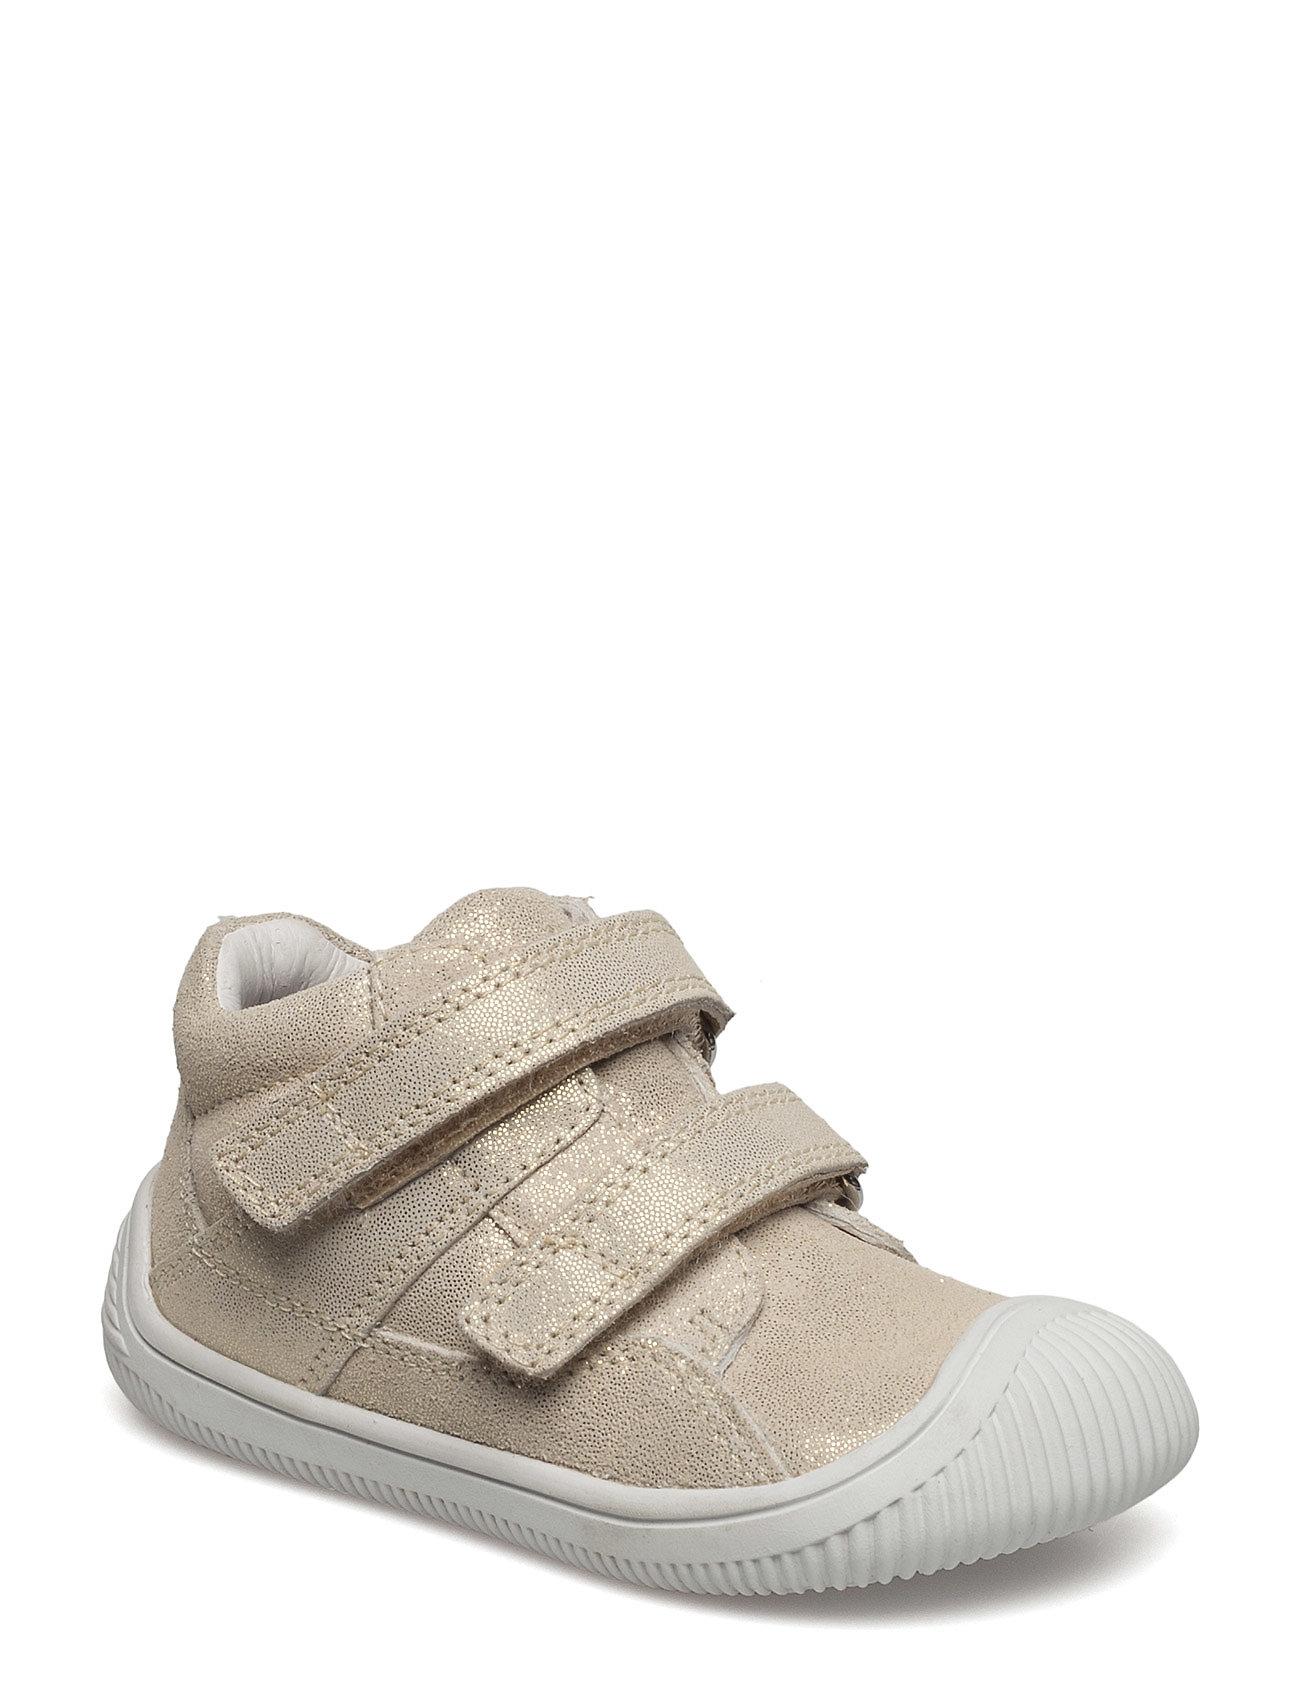 Walk With Velcro Bundgaard Sko & Sneakers til Børn i